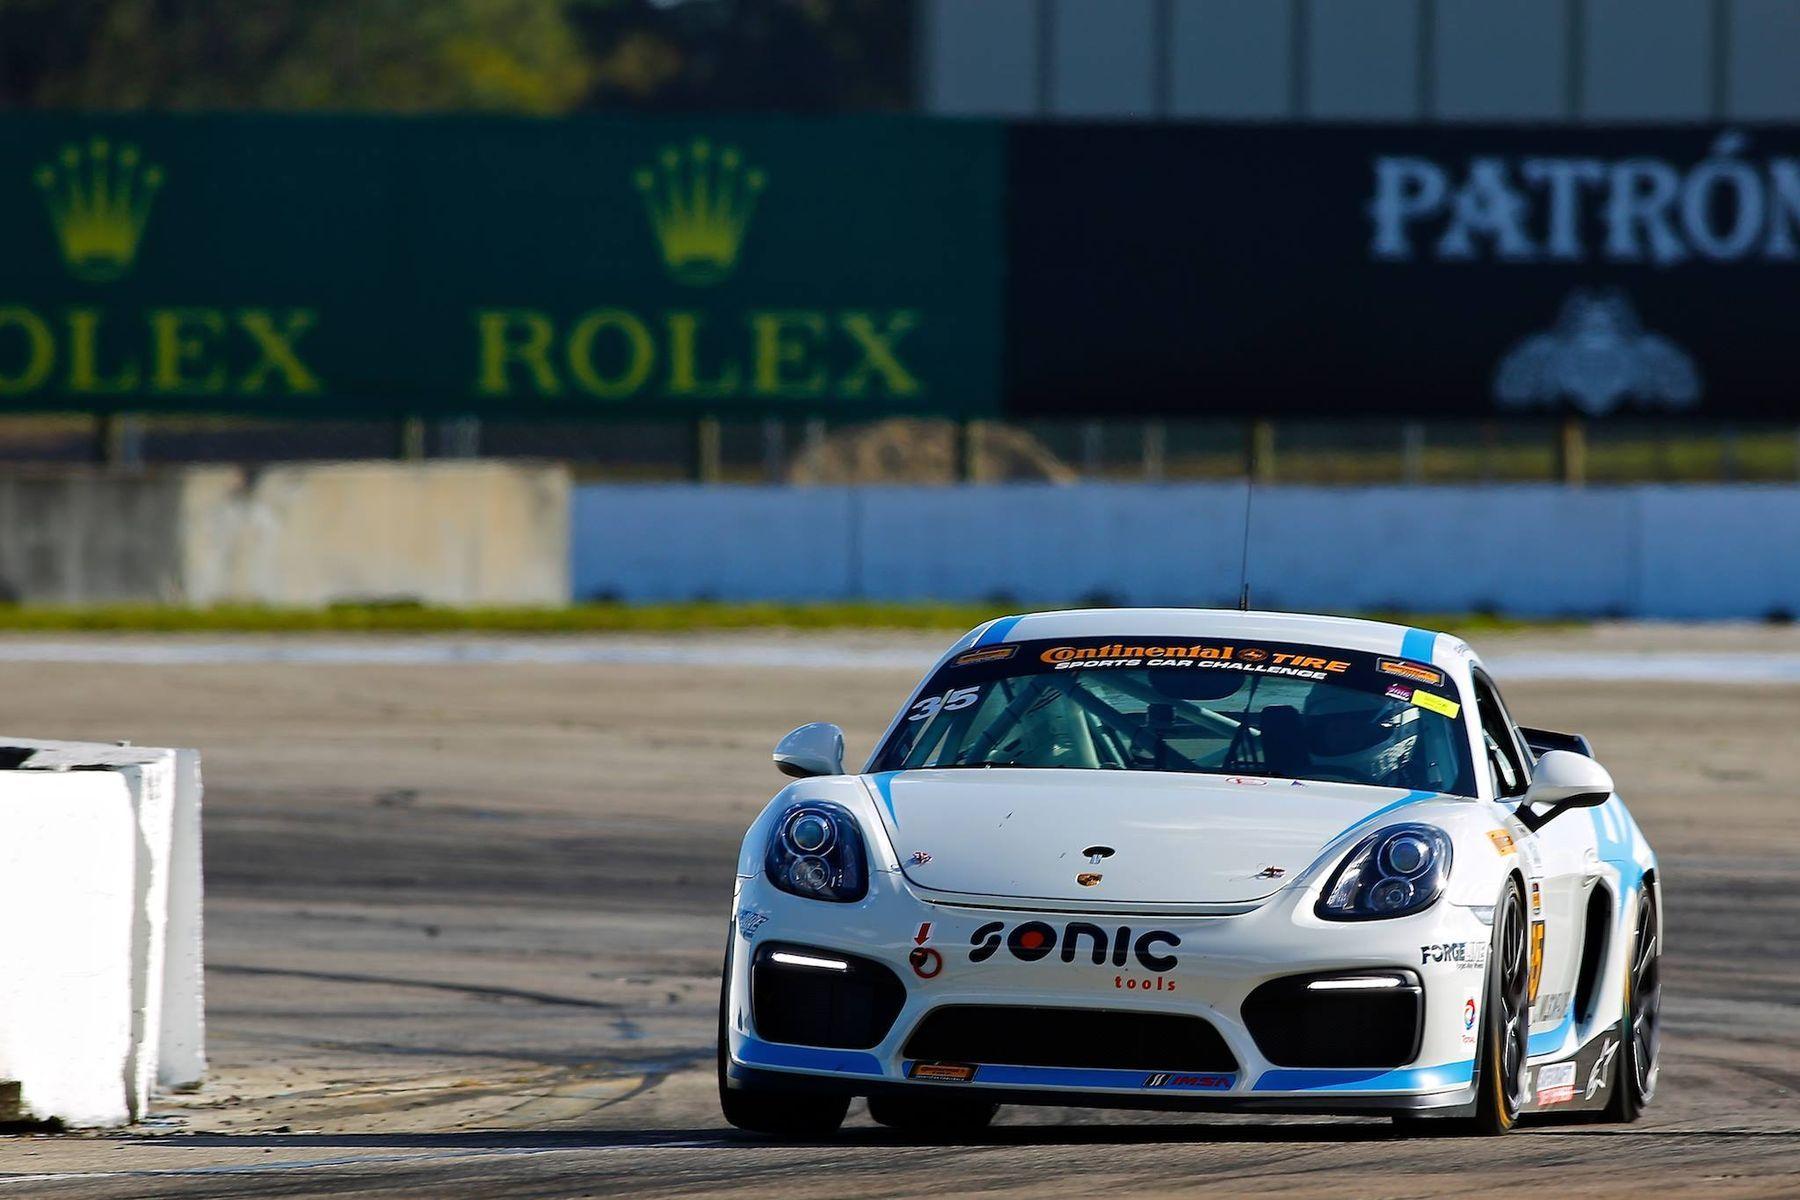 2016 Porsche Cayman | CJ Wilson Racing's #35 GS Class Porsche Cayman Clubsport on Forgeline One PIece Forged Monoblock GS1R Wheels